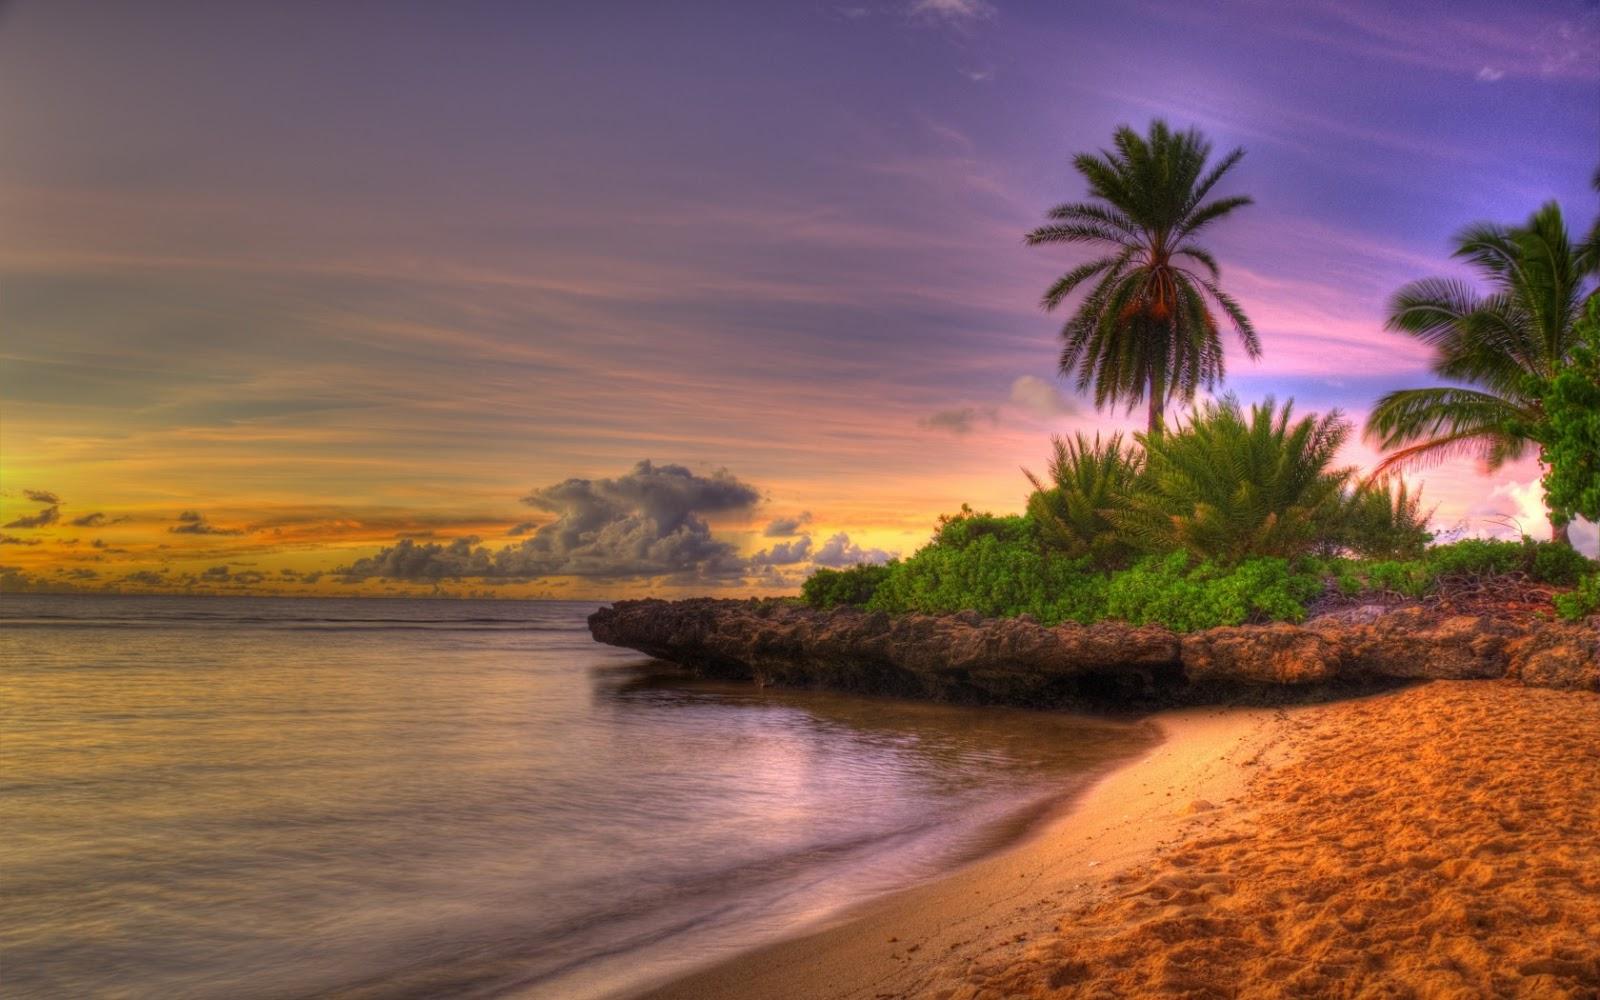 hermosos paisajes hdr de playas fotos e im genes en fotoblog x. Black Bedroom Furniture Sets. Home Design Ideas